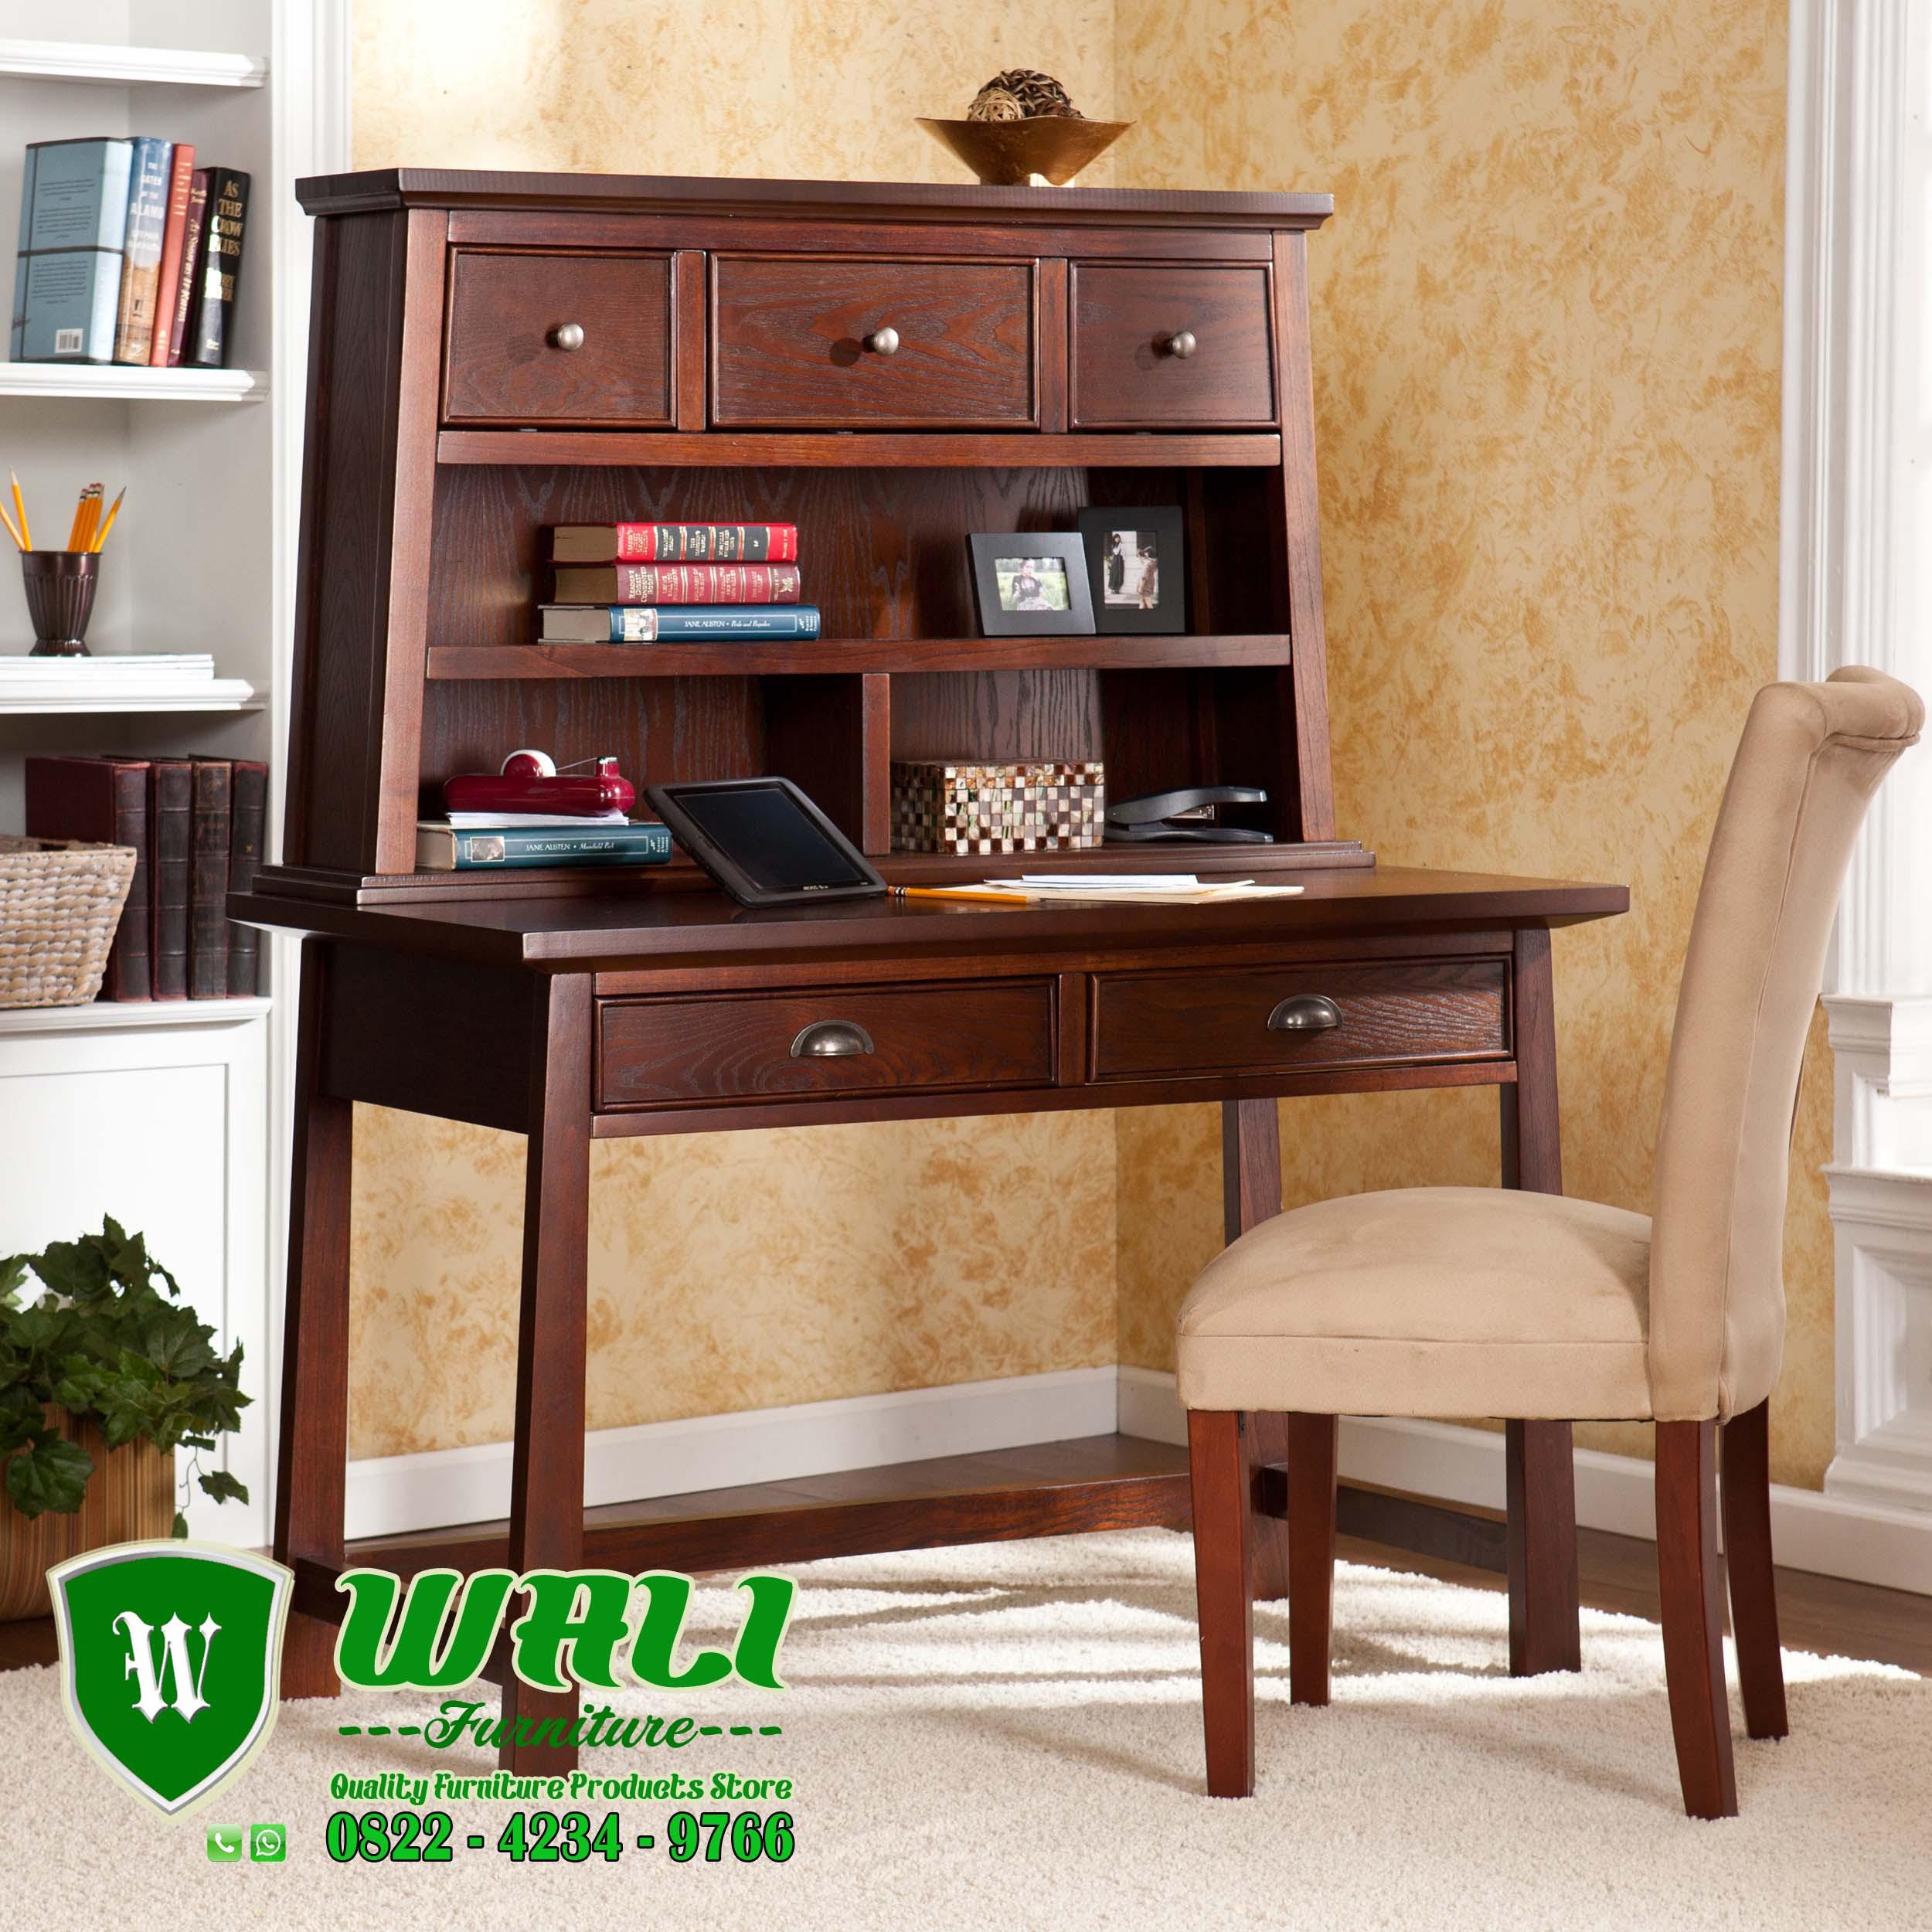 traditional style secretary desk - HD1280×1280